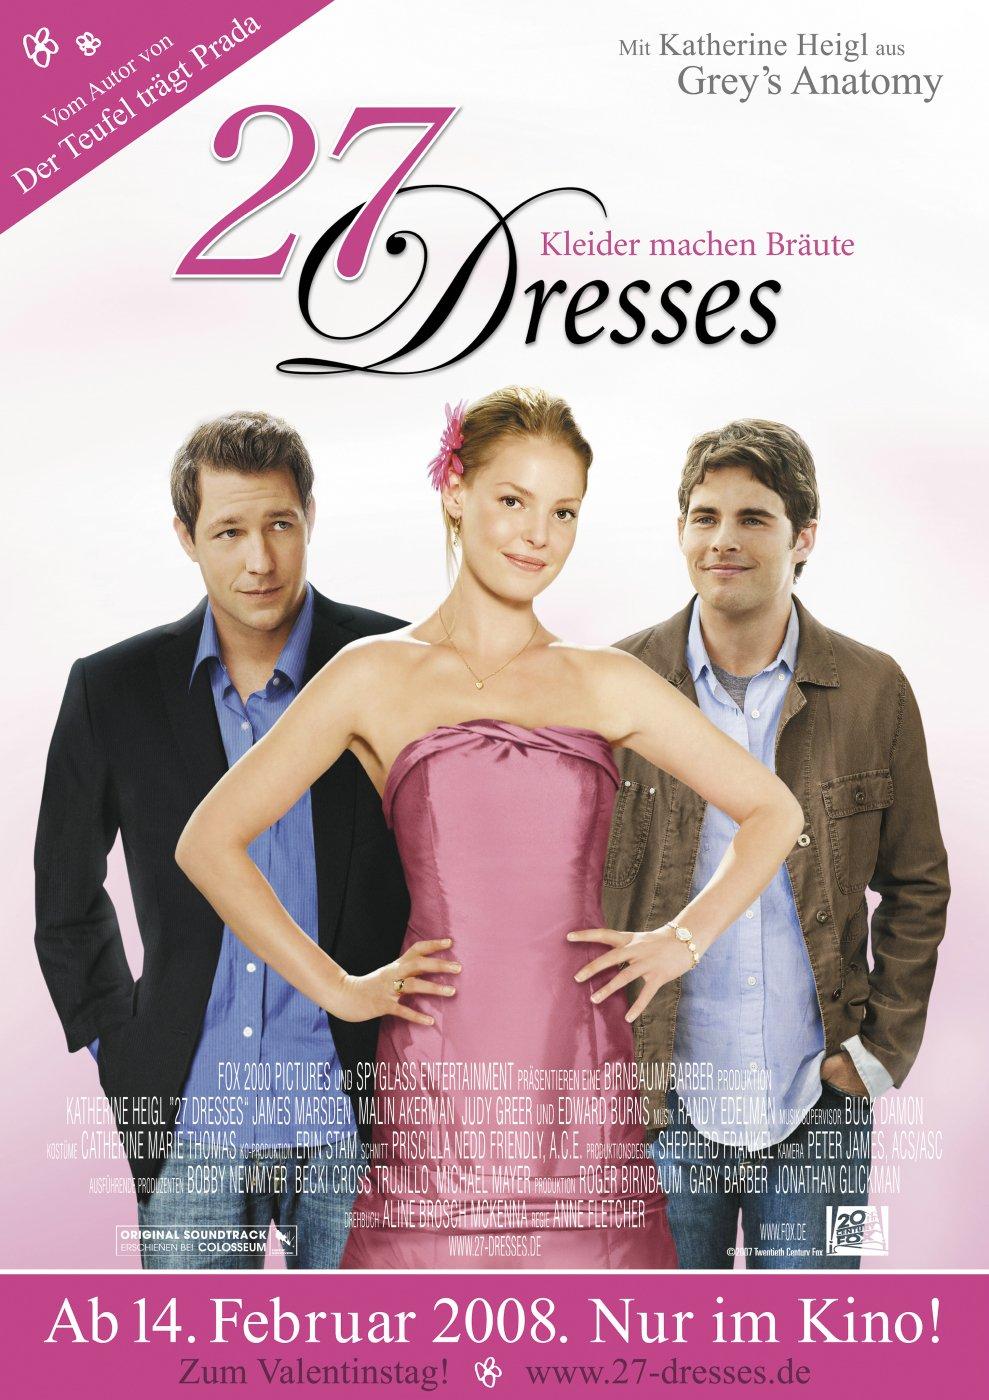 27 Dresses (2008) poster - FreeMoviePosters.net